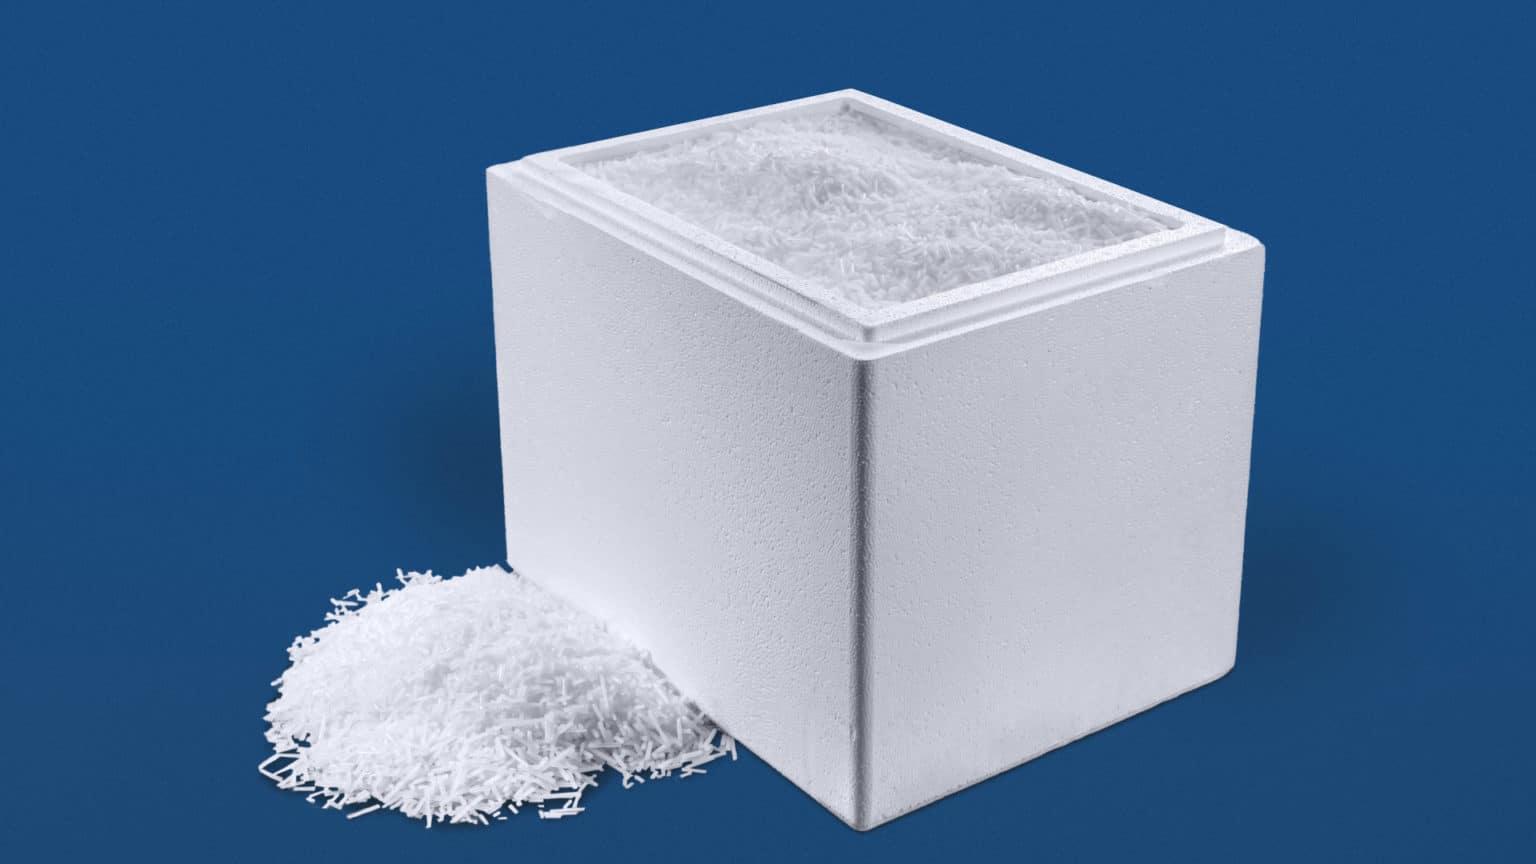 Trockeneis-Strahlpellets-27-kg-in-Styropor-Thermobox